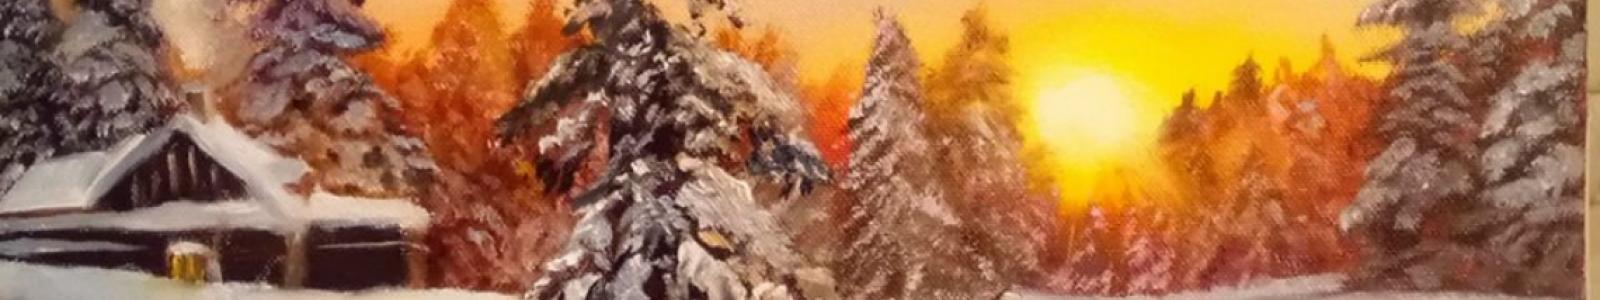 Gallery Painter Nataliya Kashubina